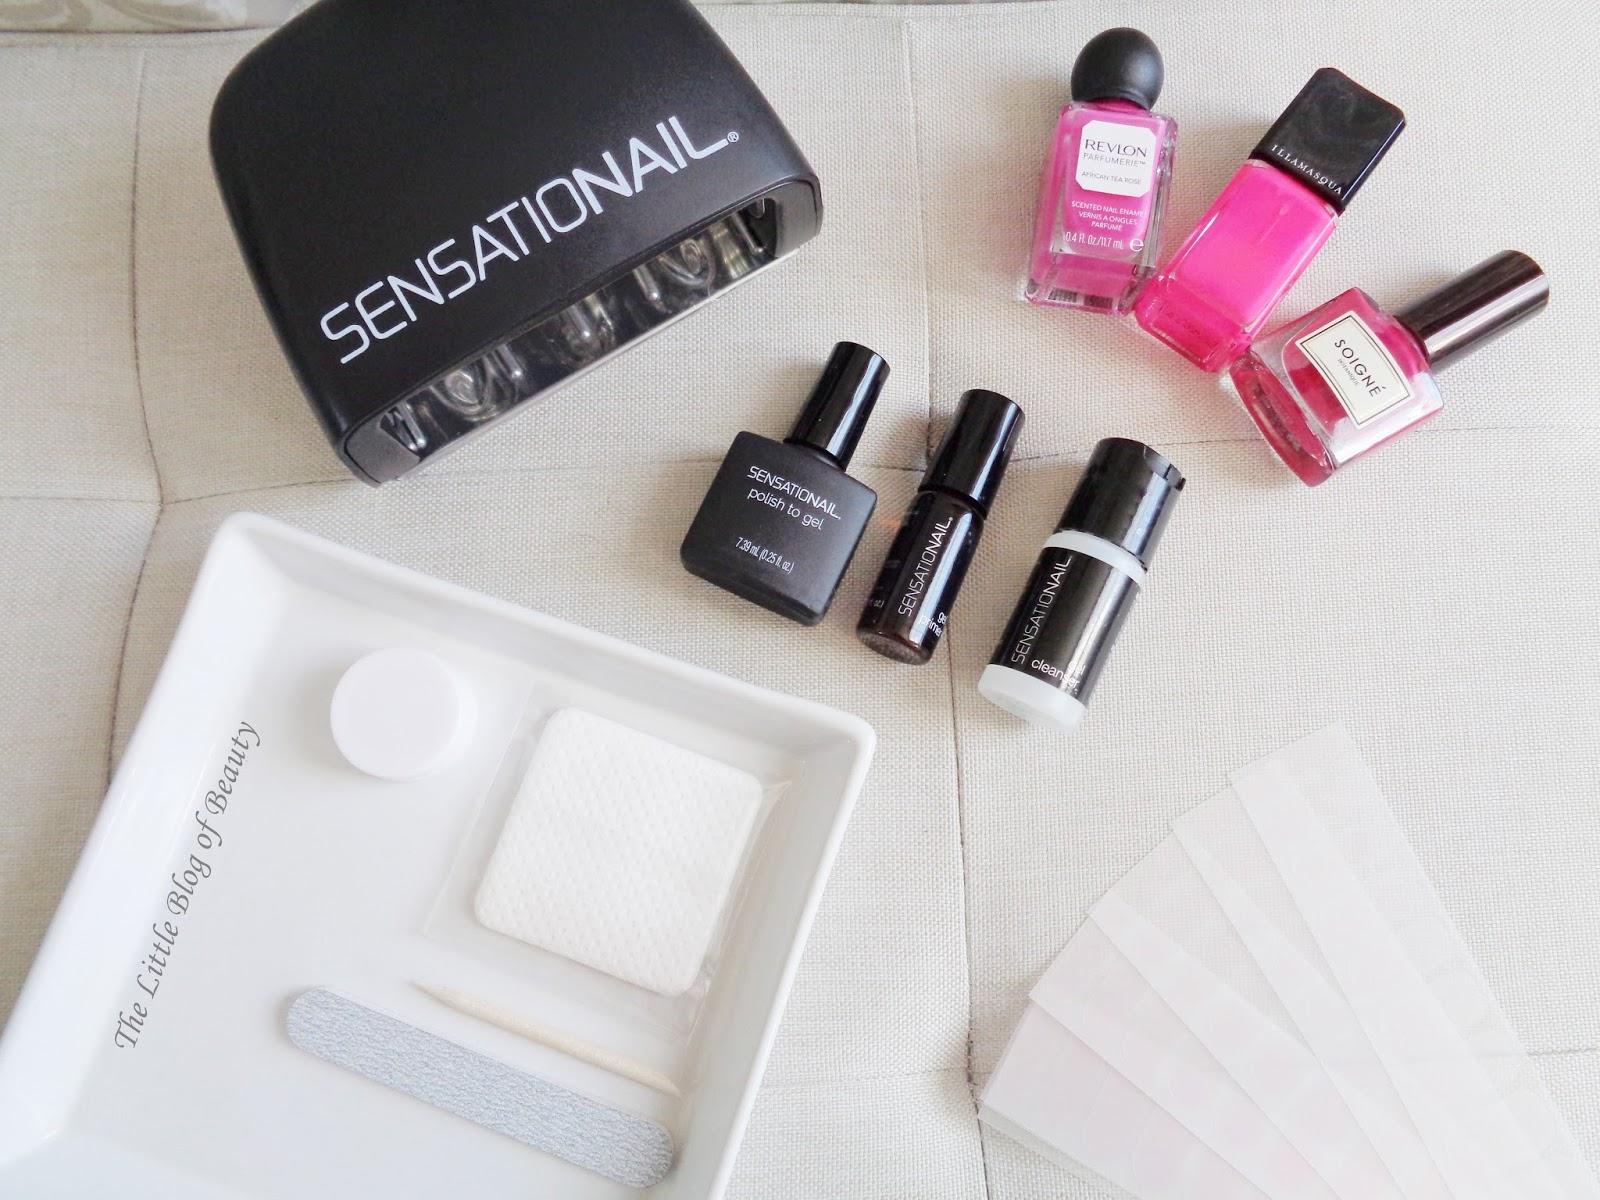 Sensationail Polish To Gel Transformer Starter Kit Amp Nail Shields The Little Blog Of Beauty